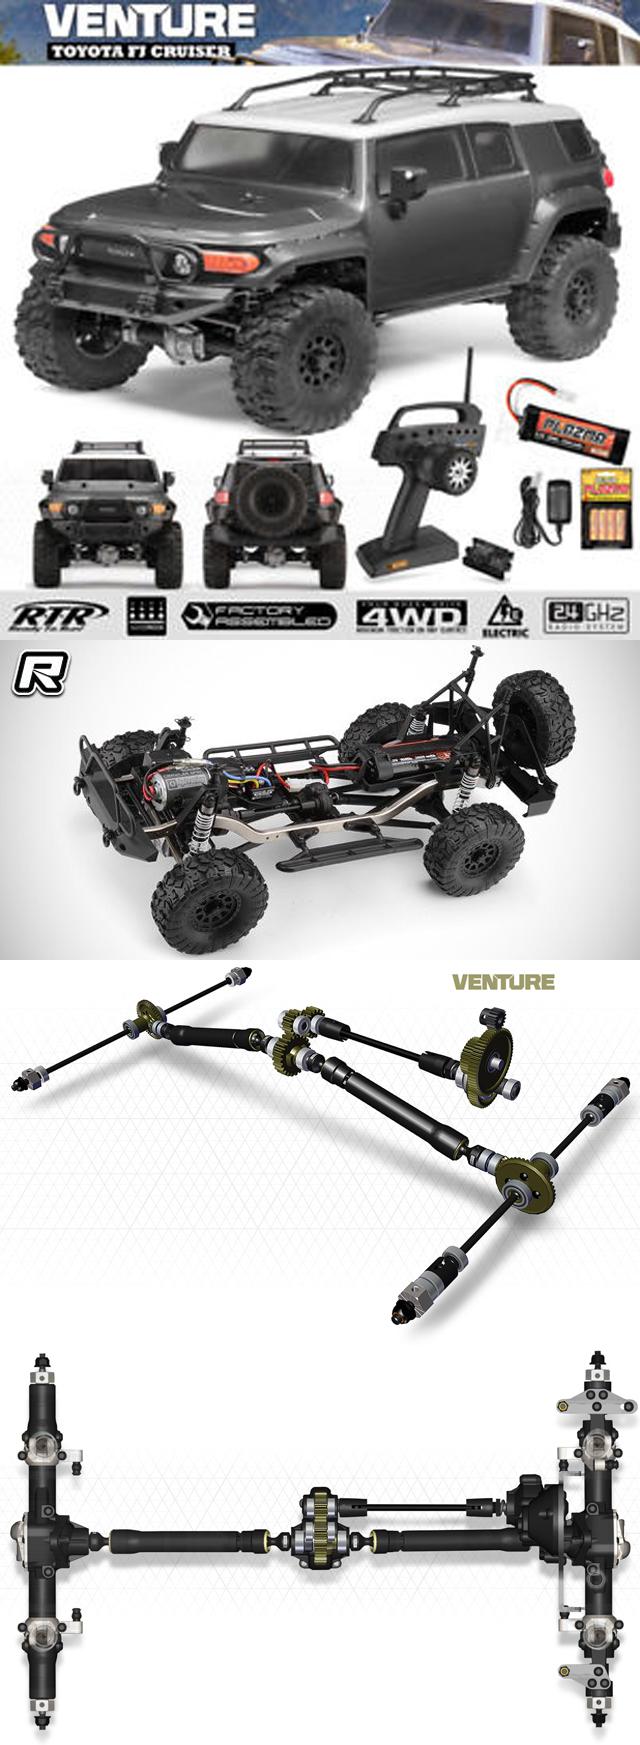 Venture Toyota FJ Cruiser RTR, 1/10 Scale, 4WD, Brushed, Gunmetal, w/ 2.4GHz Radio System GREY